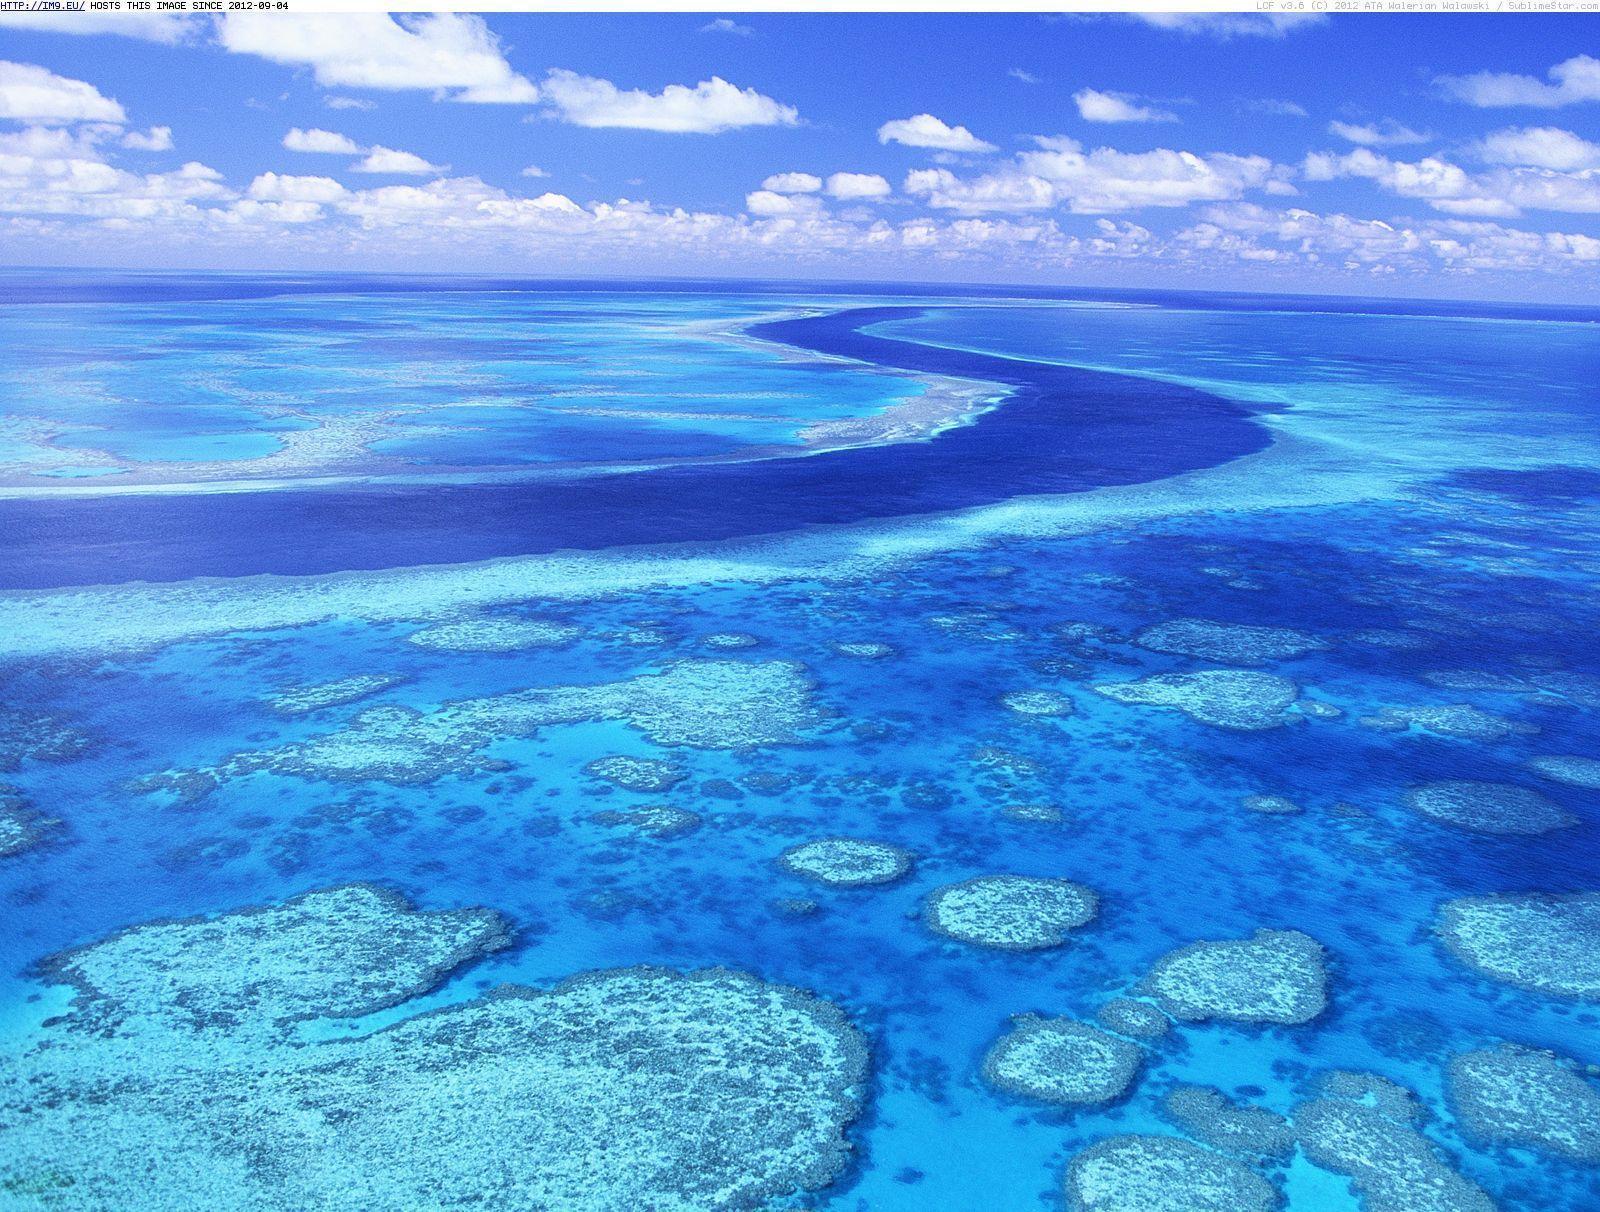 Great Barrier Reef Wallpapers Wallpaper Cave HD Wallpapers Download Free Images Wallpaper [1000image.com]